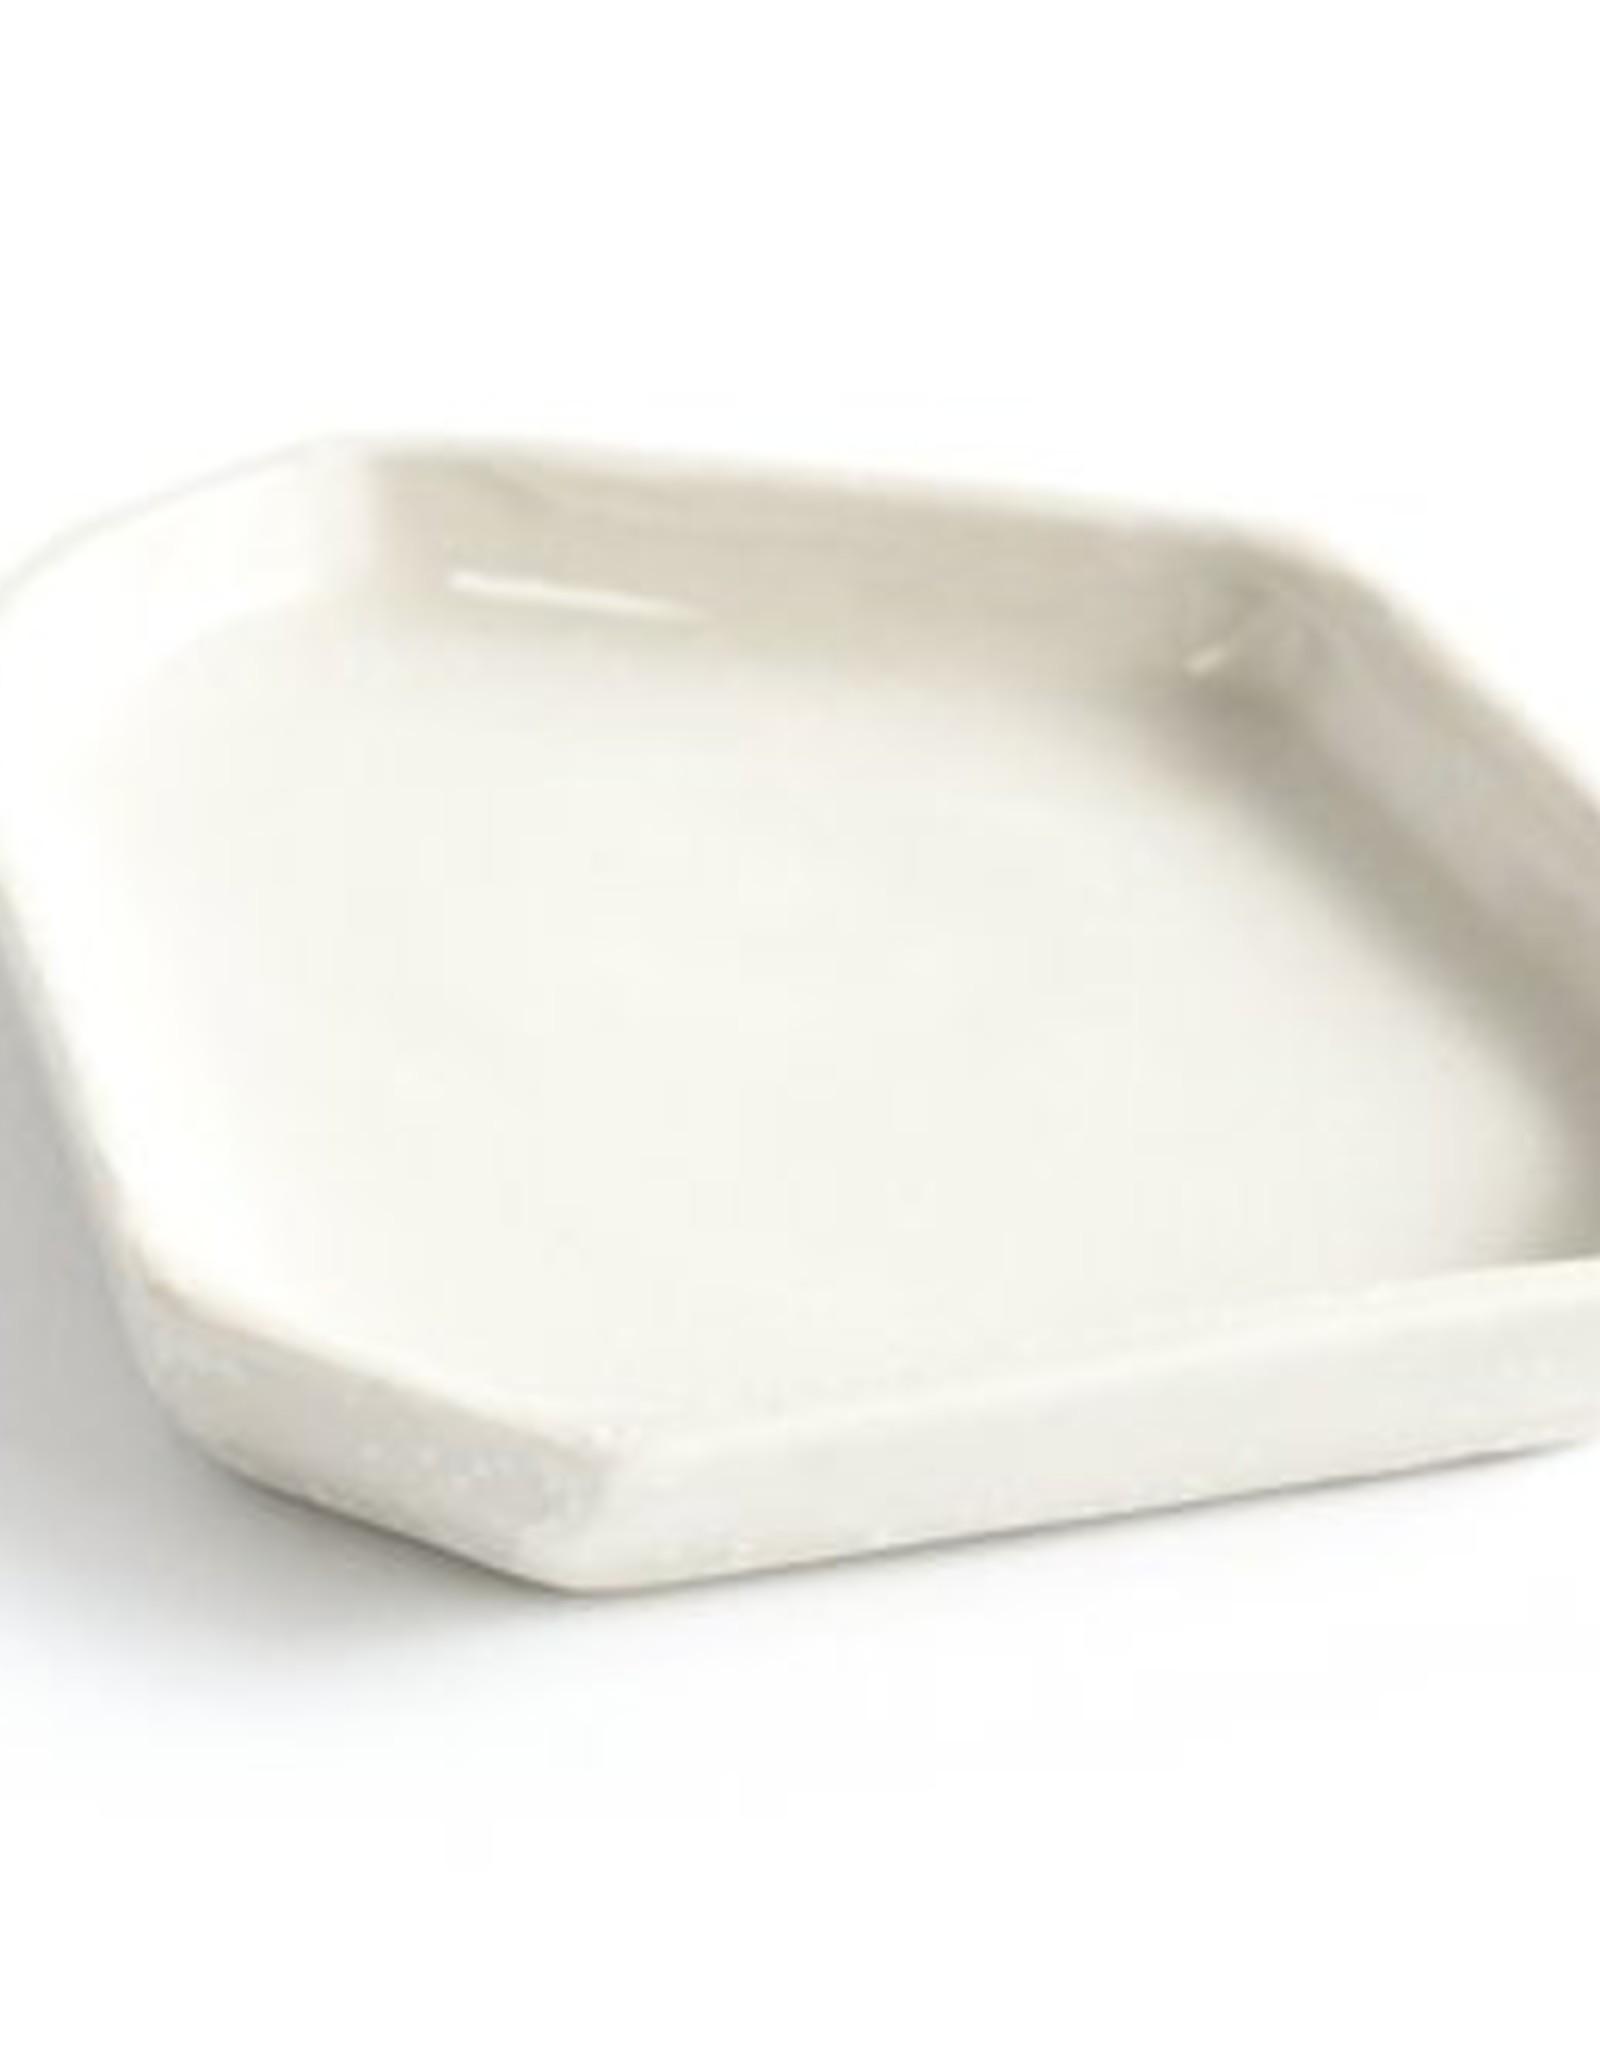 Lauren HB Diamond Dish